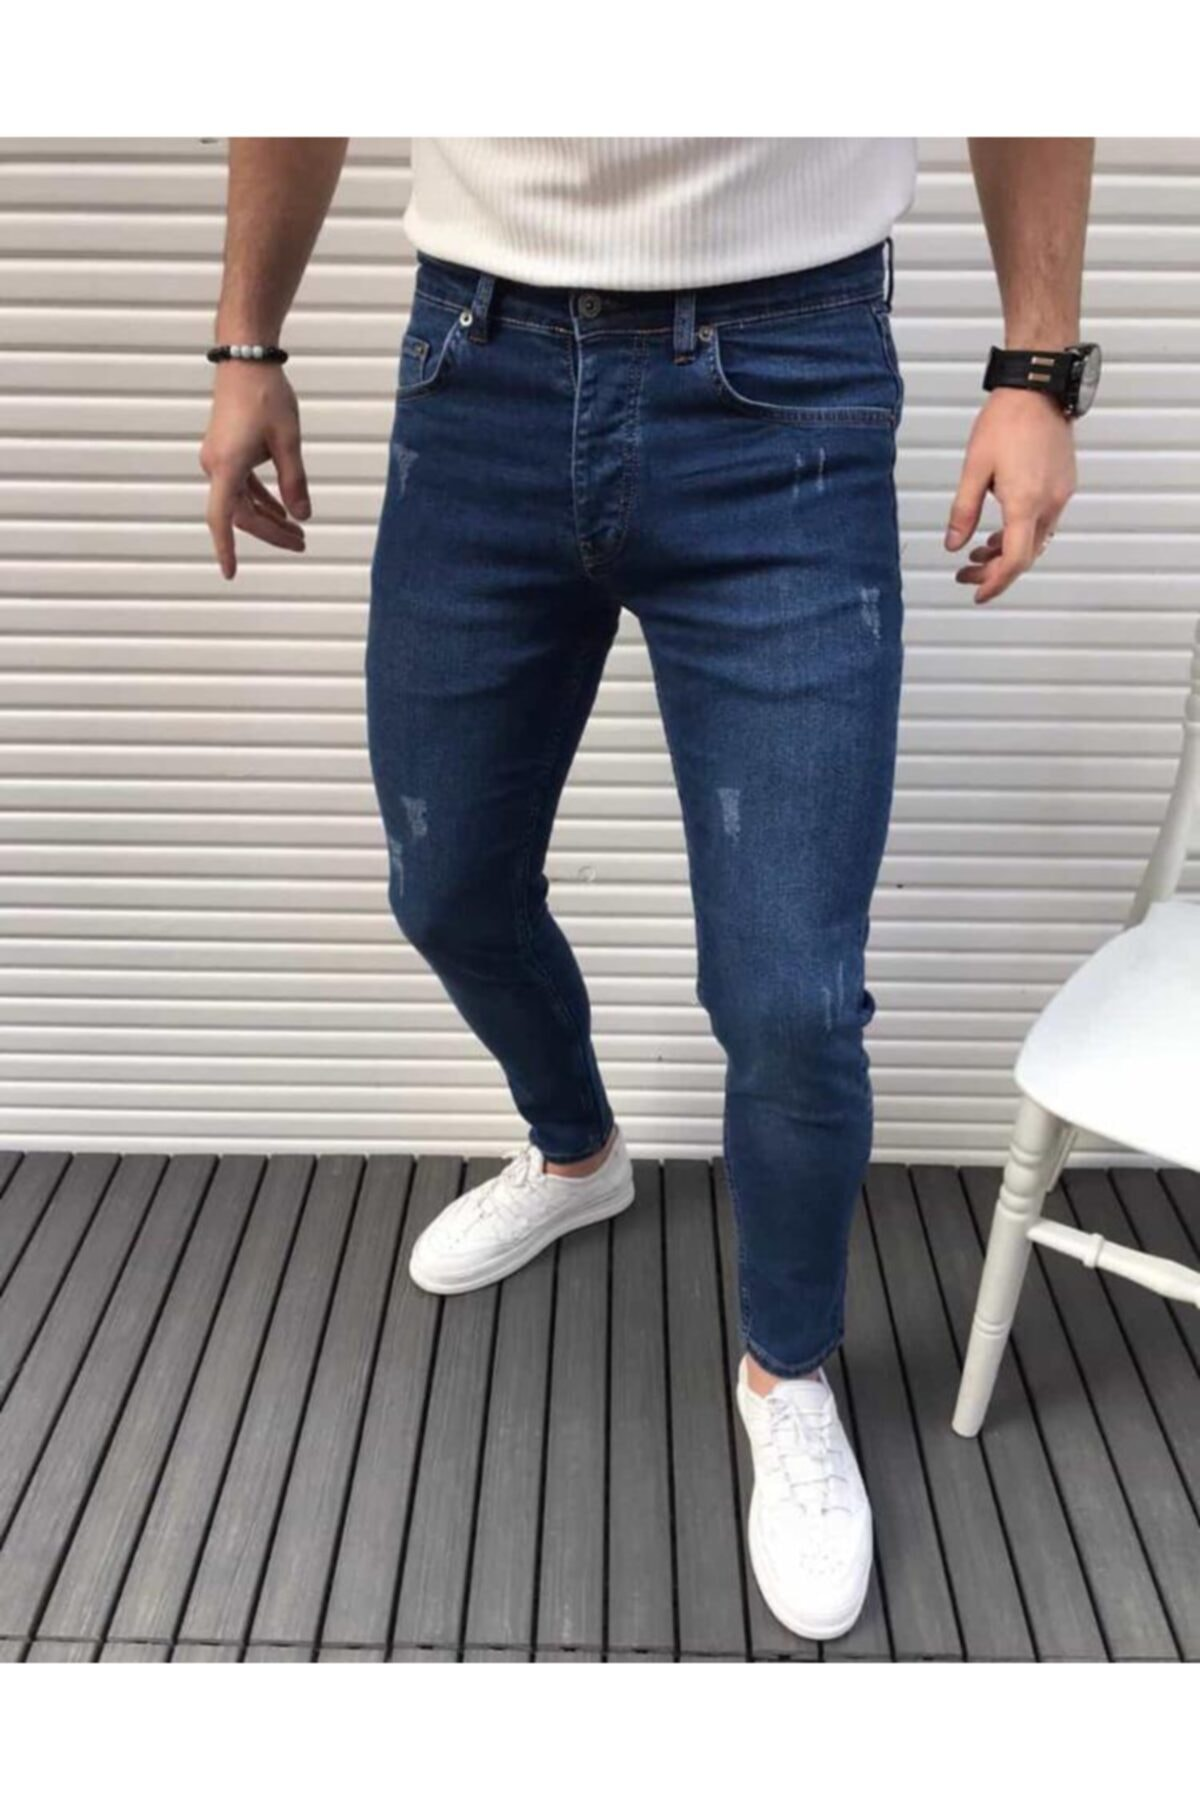 h&ç giyim Erkek Kot Pantolon Lacivert 2